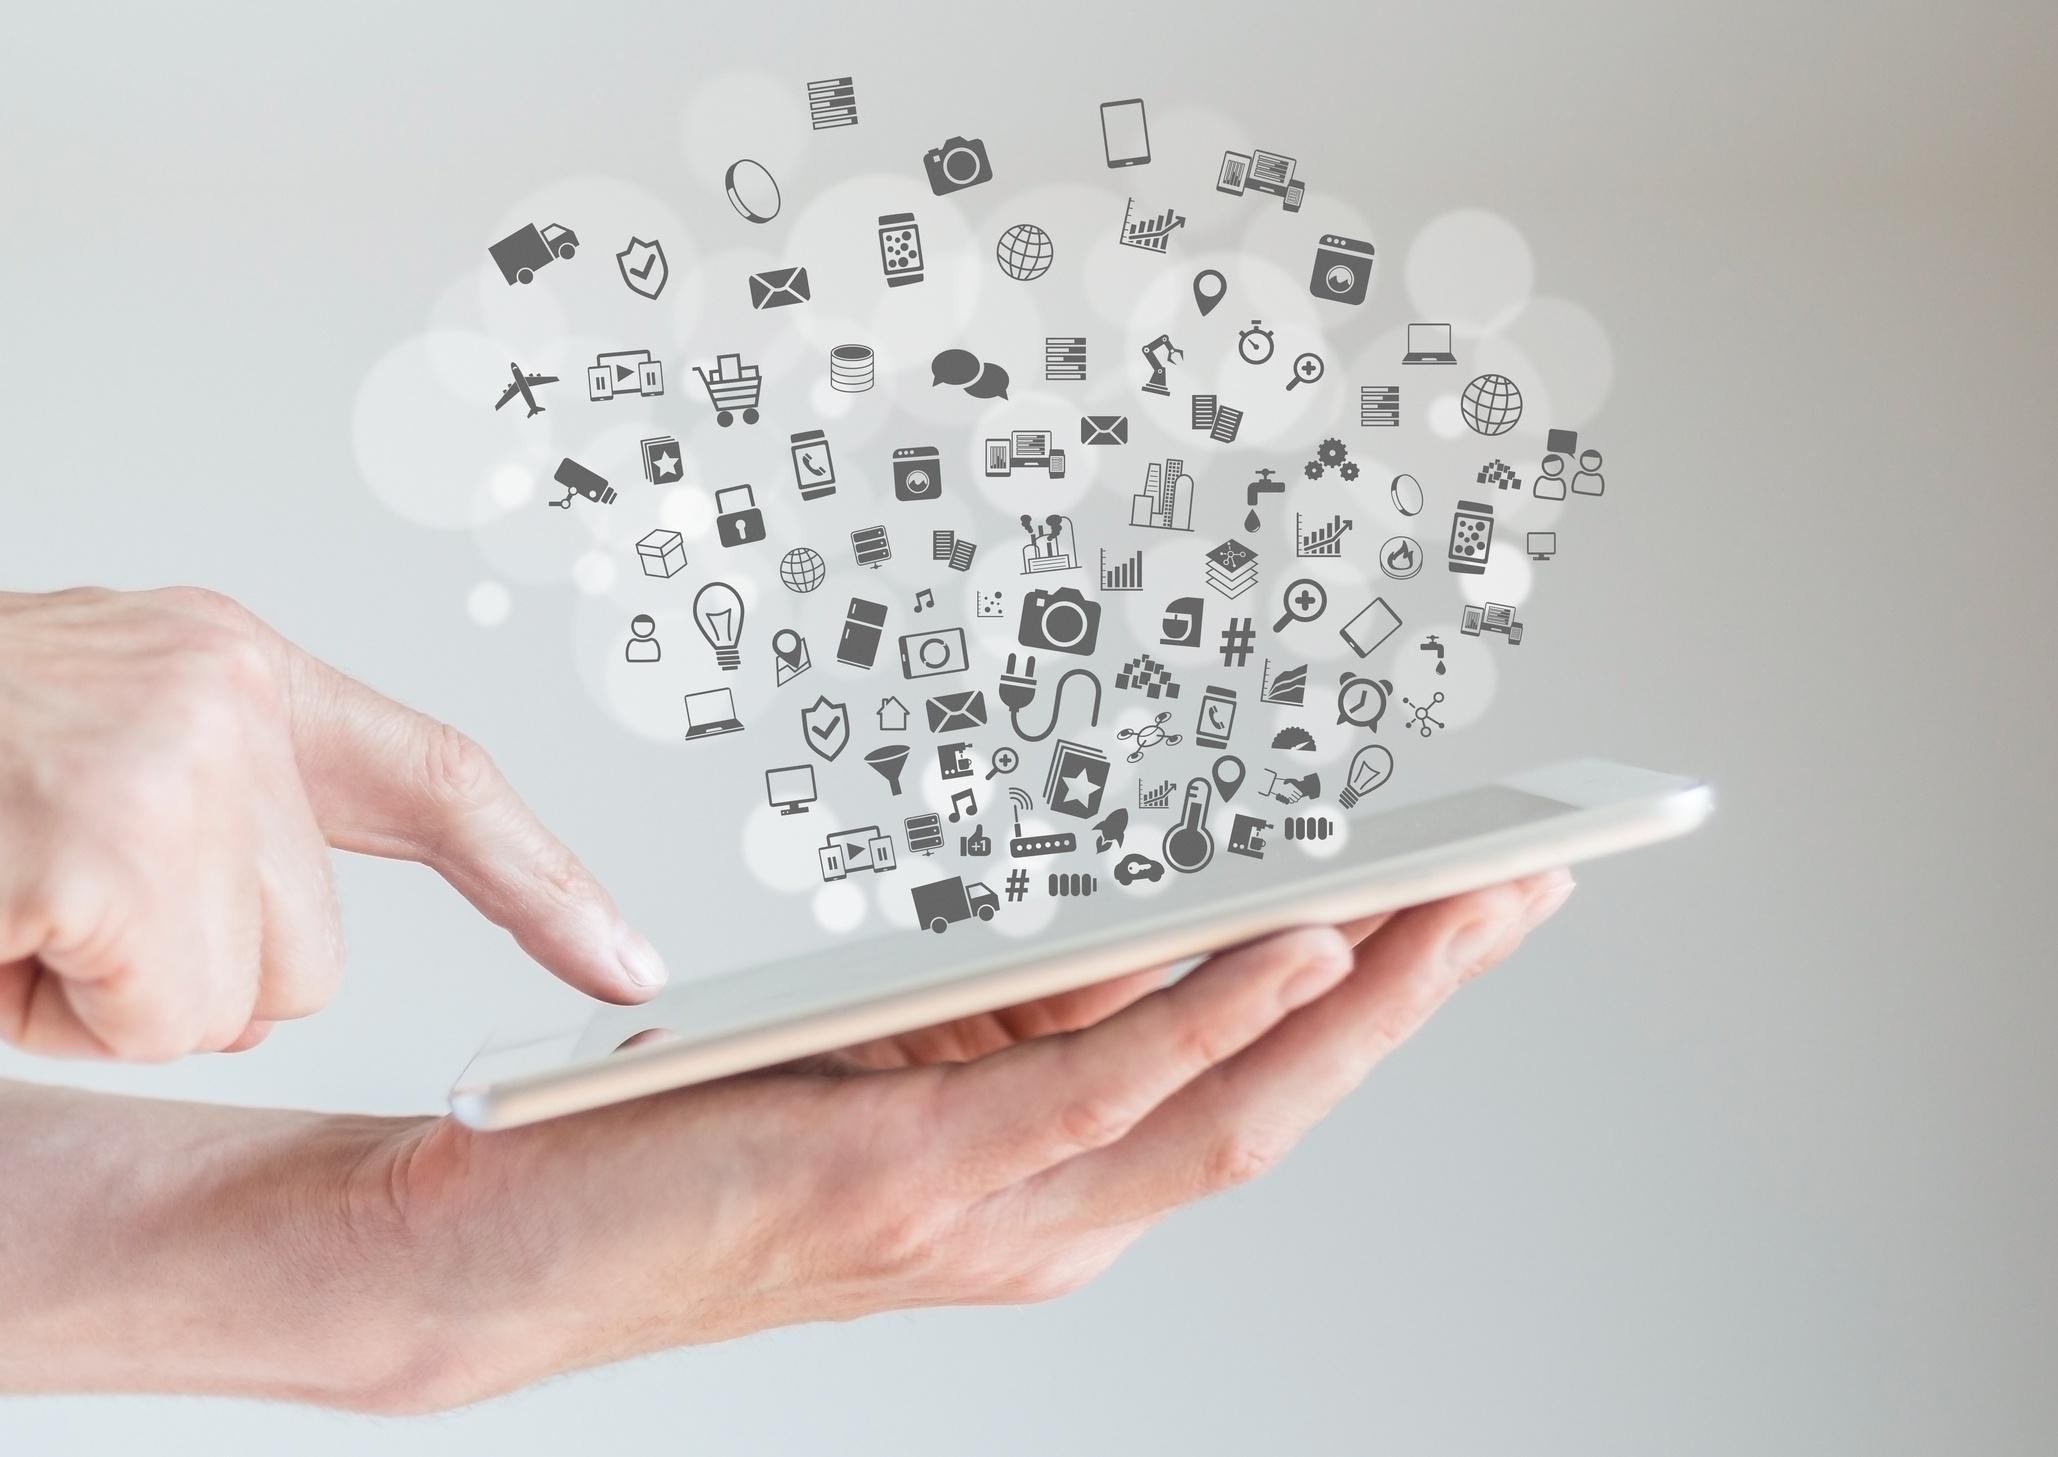 IoT Drives Demand for Mobile App Development